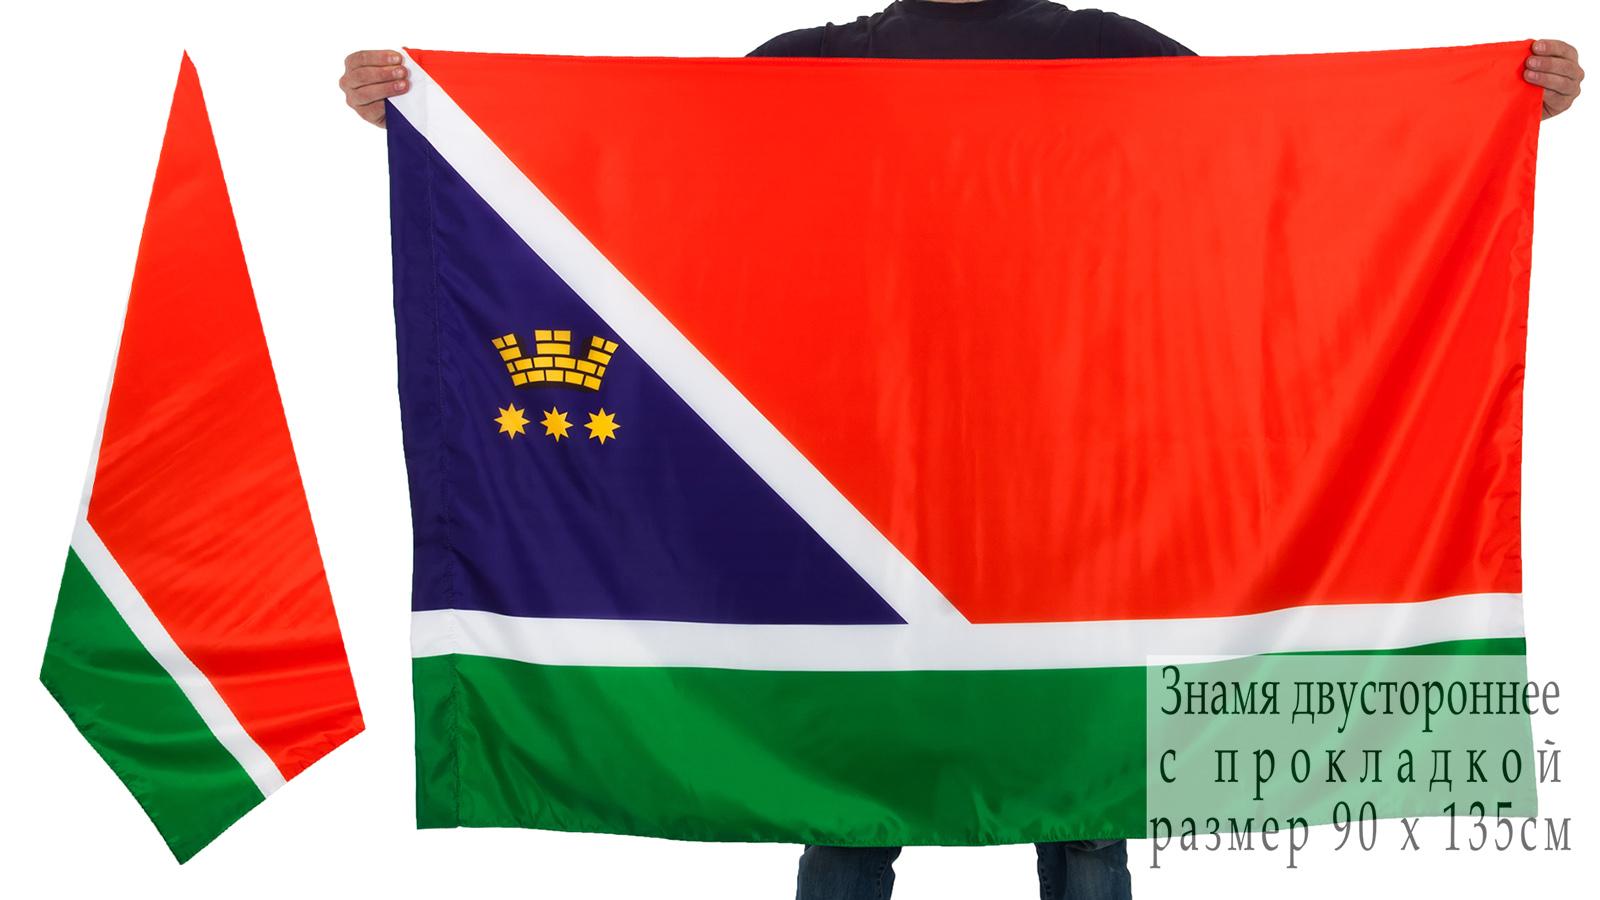 Двухсторонний флаг Благовещенска